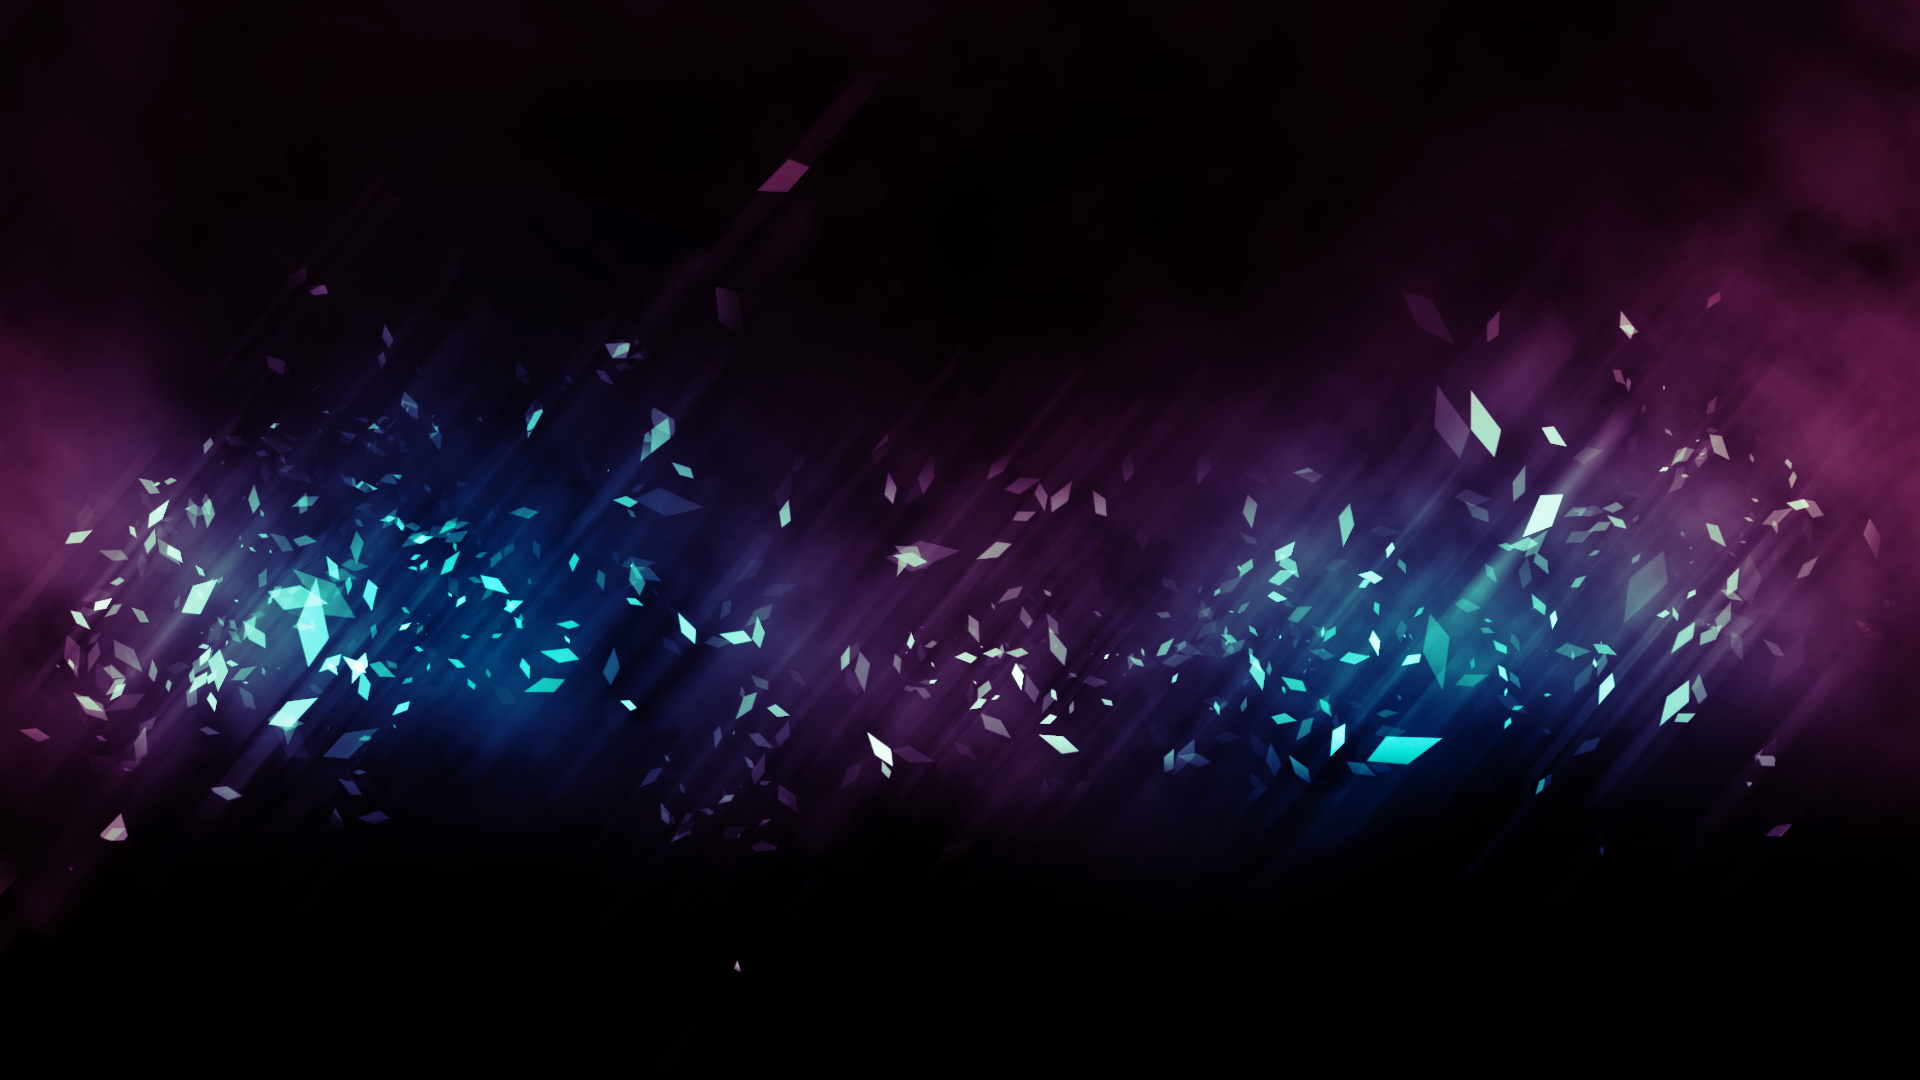 Background image 1080p - Desktop Wallpaper Backgrounds 1080p